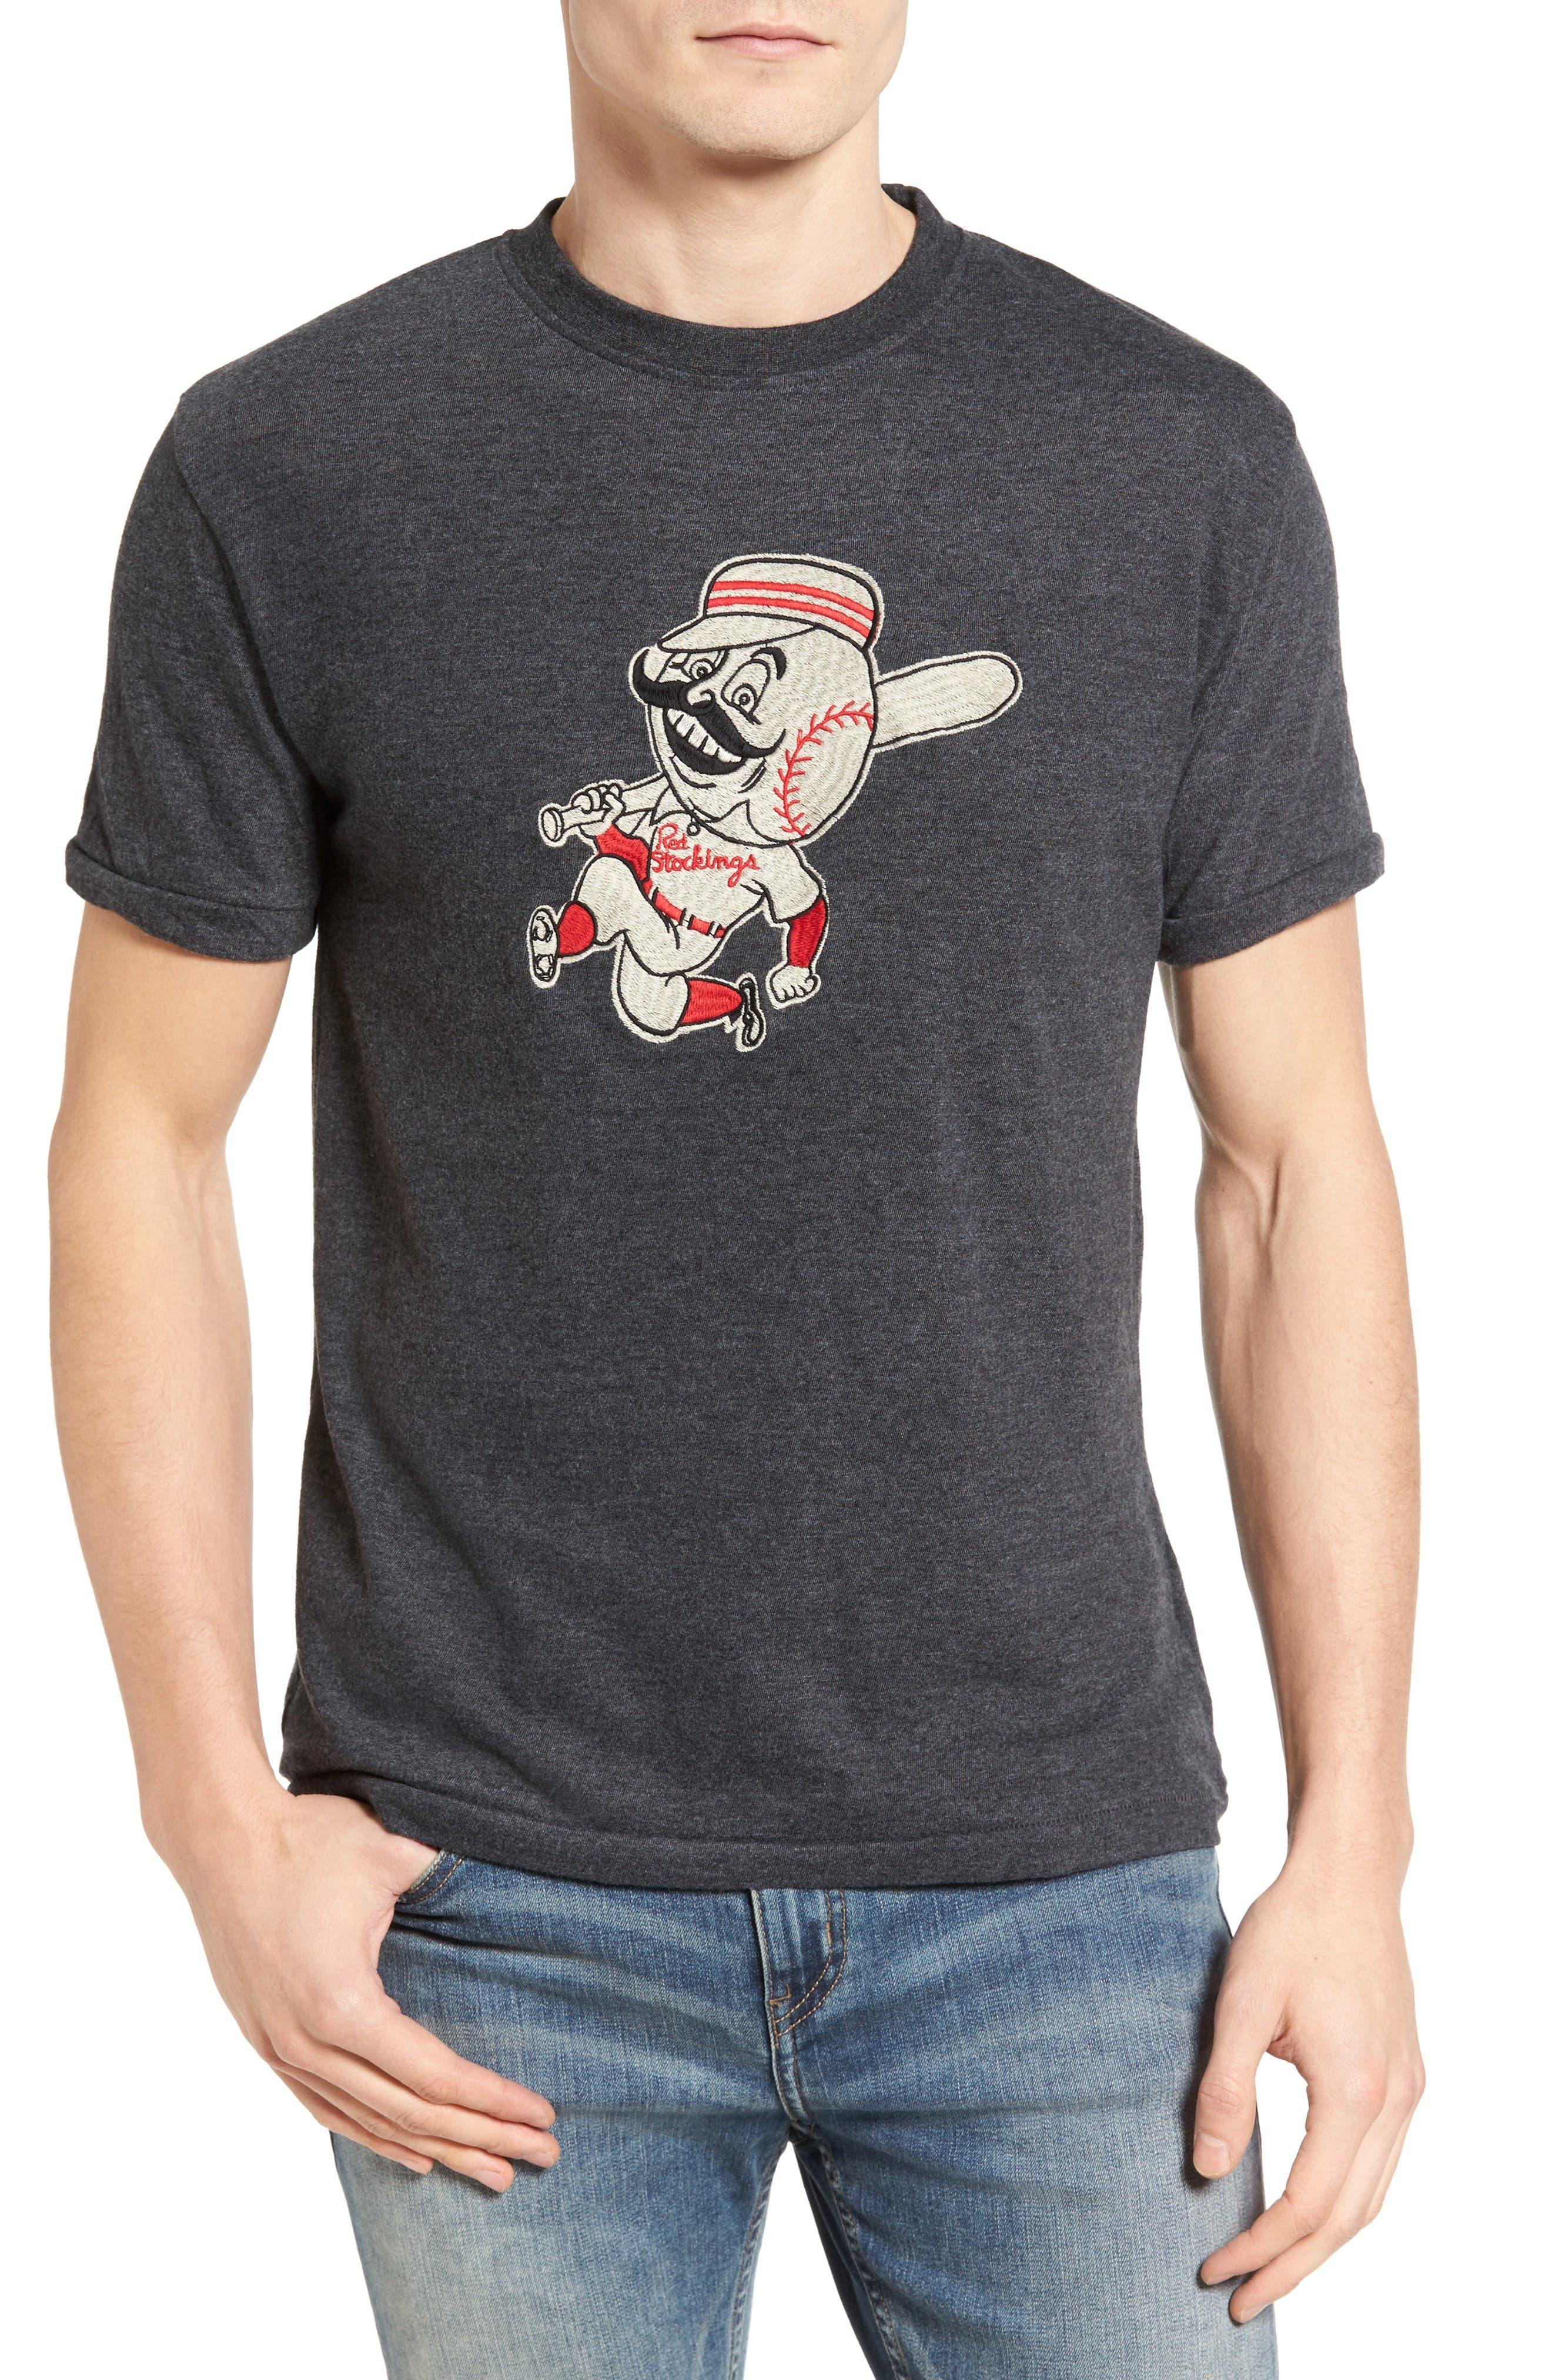 American Needle Hillwood Cincinnati Reds T-Shirt